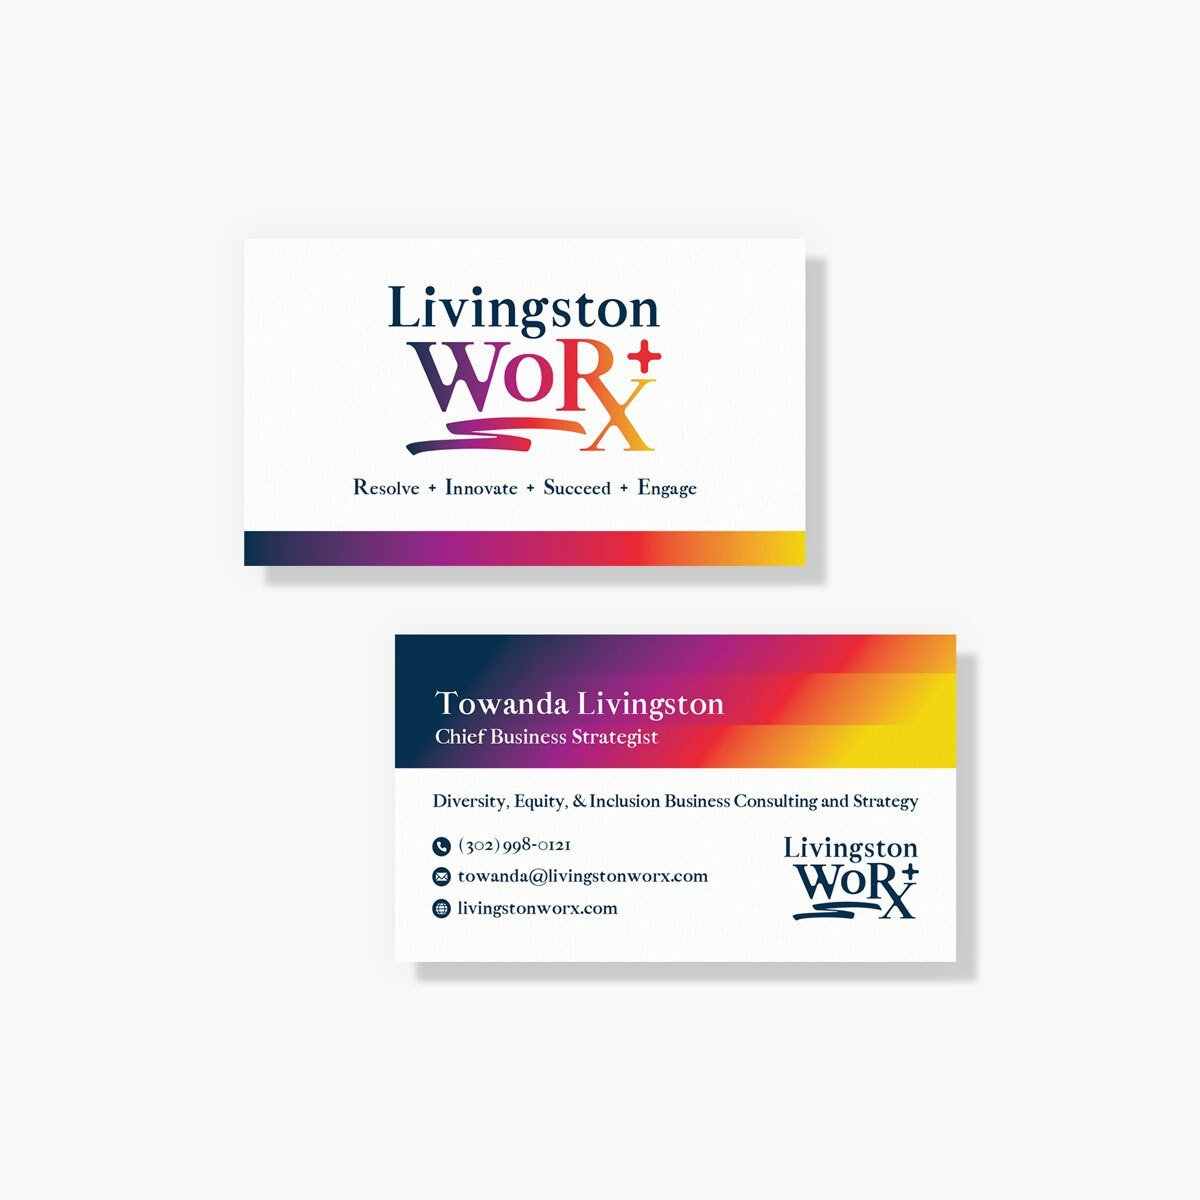 DEI consultant business card design from from BrandSwan, a Delaware branding agency